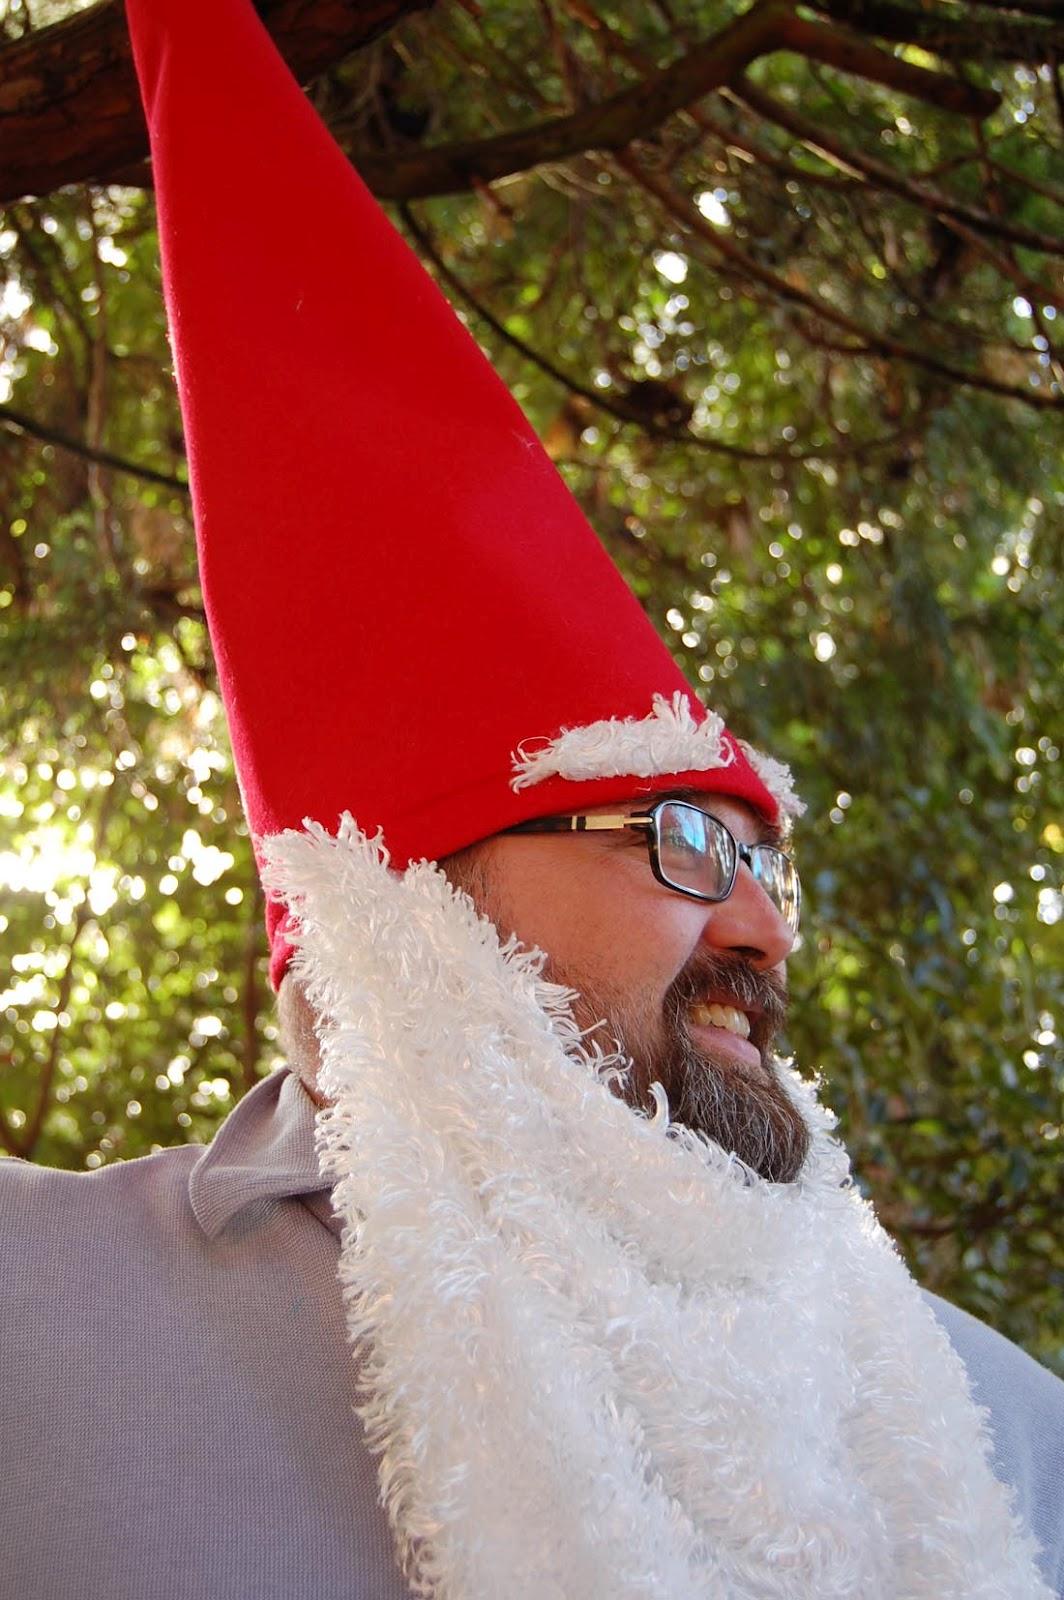 Female Gnome: Craftzies: Garden Gnome Halloween Costumes